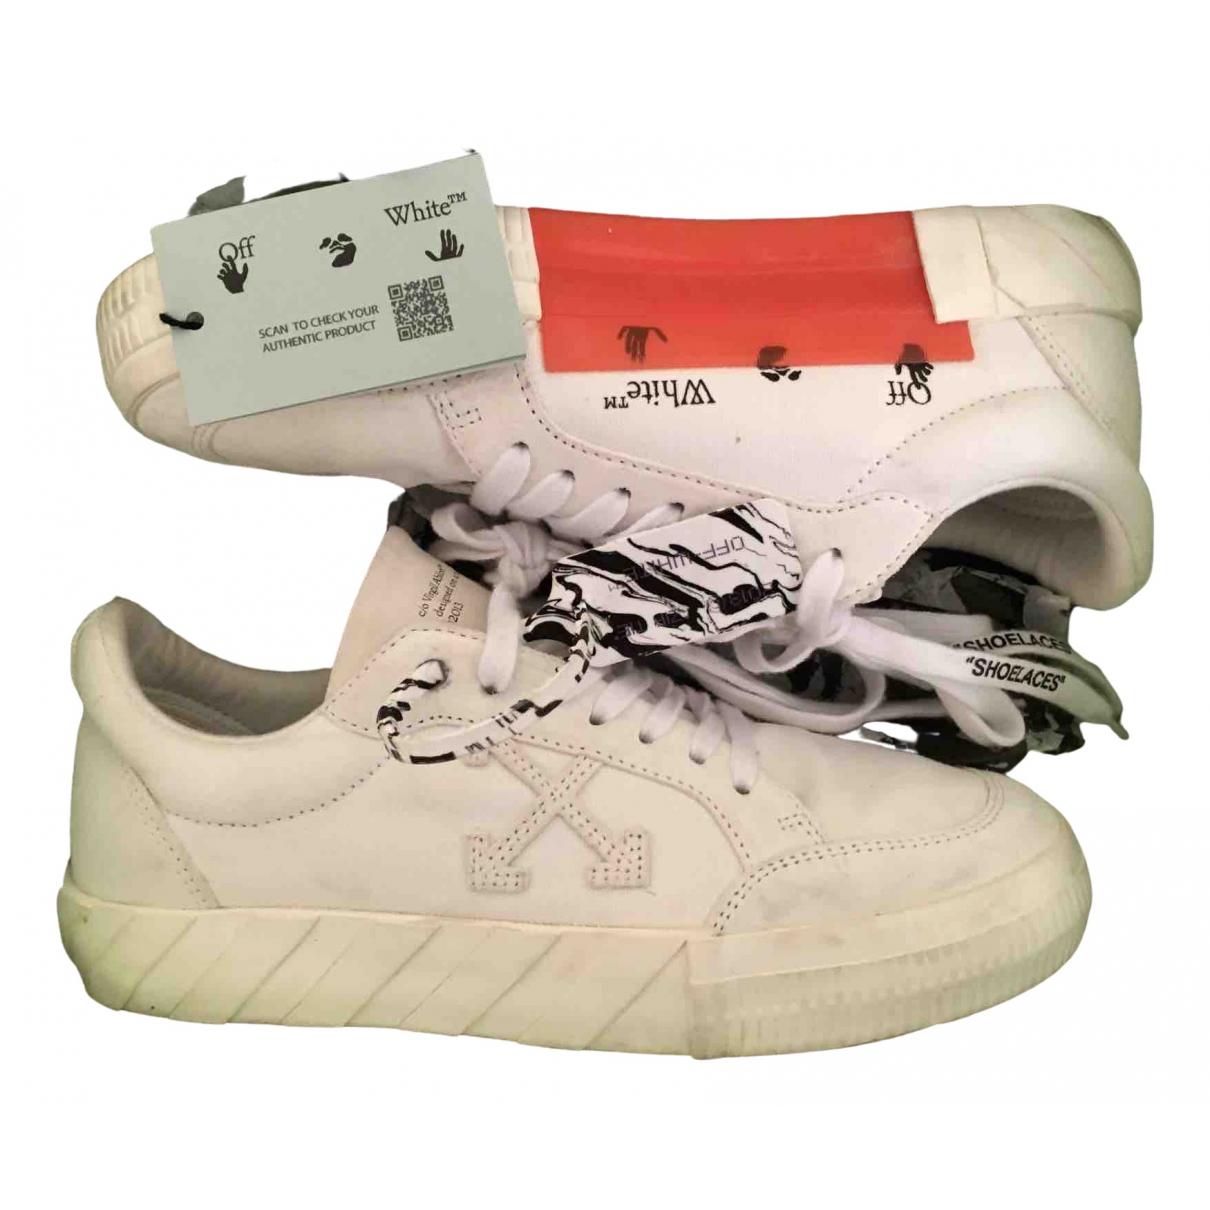 Off-white - Baskets Vulcalized pour femme en suede - blanc